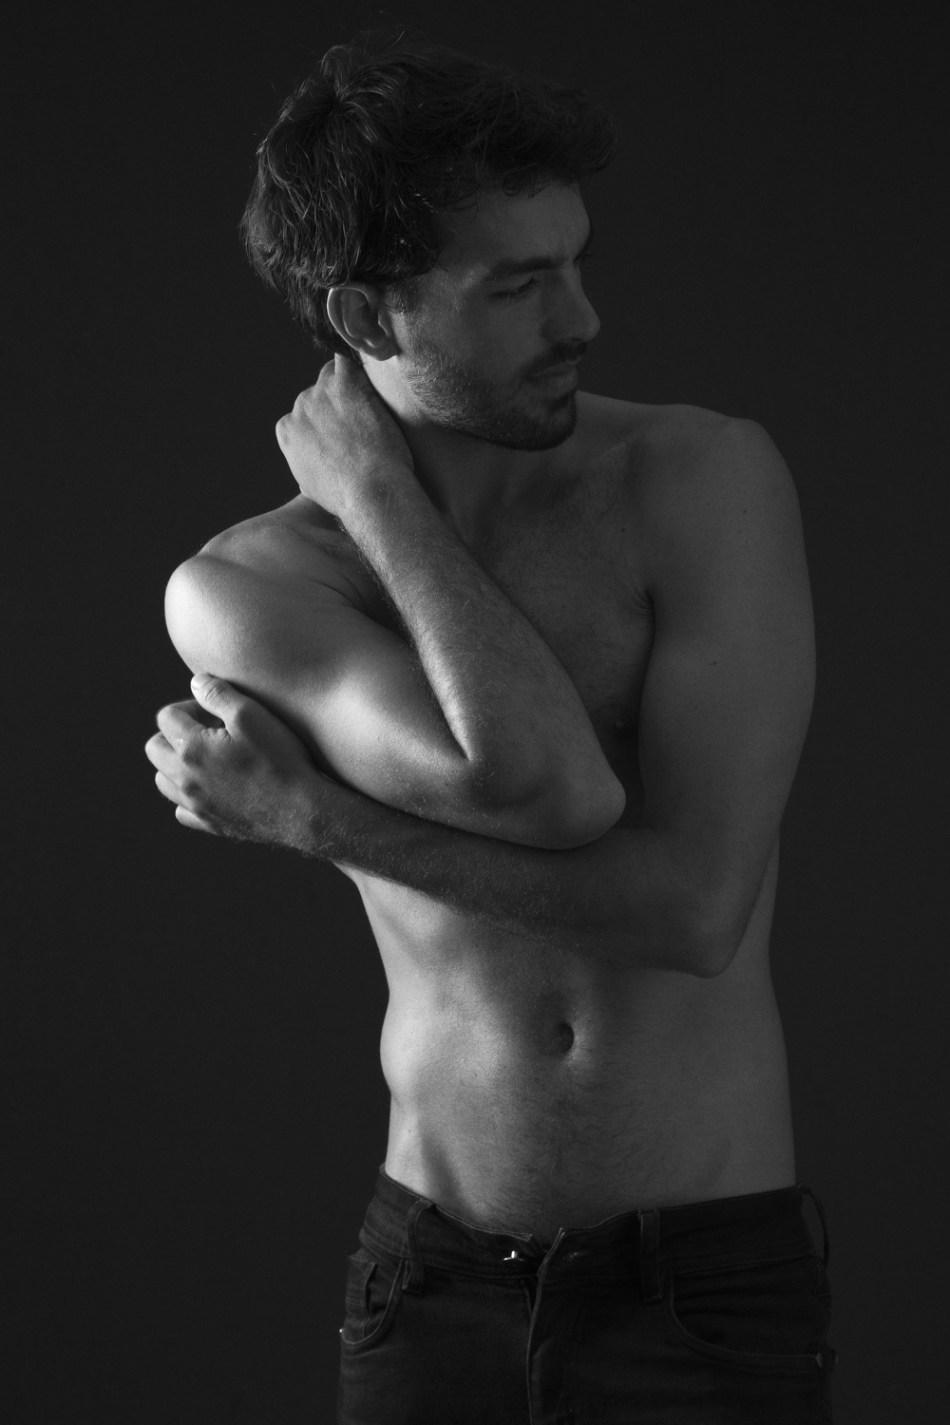 Andre Alburquenque by Rene de la Cruz (5)